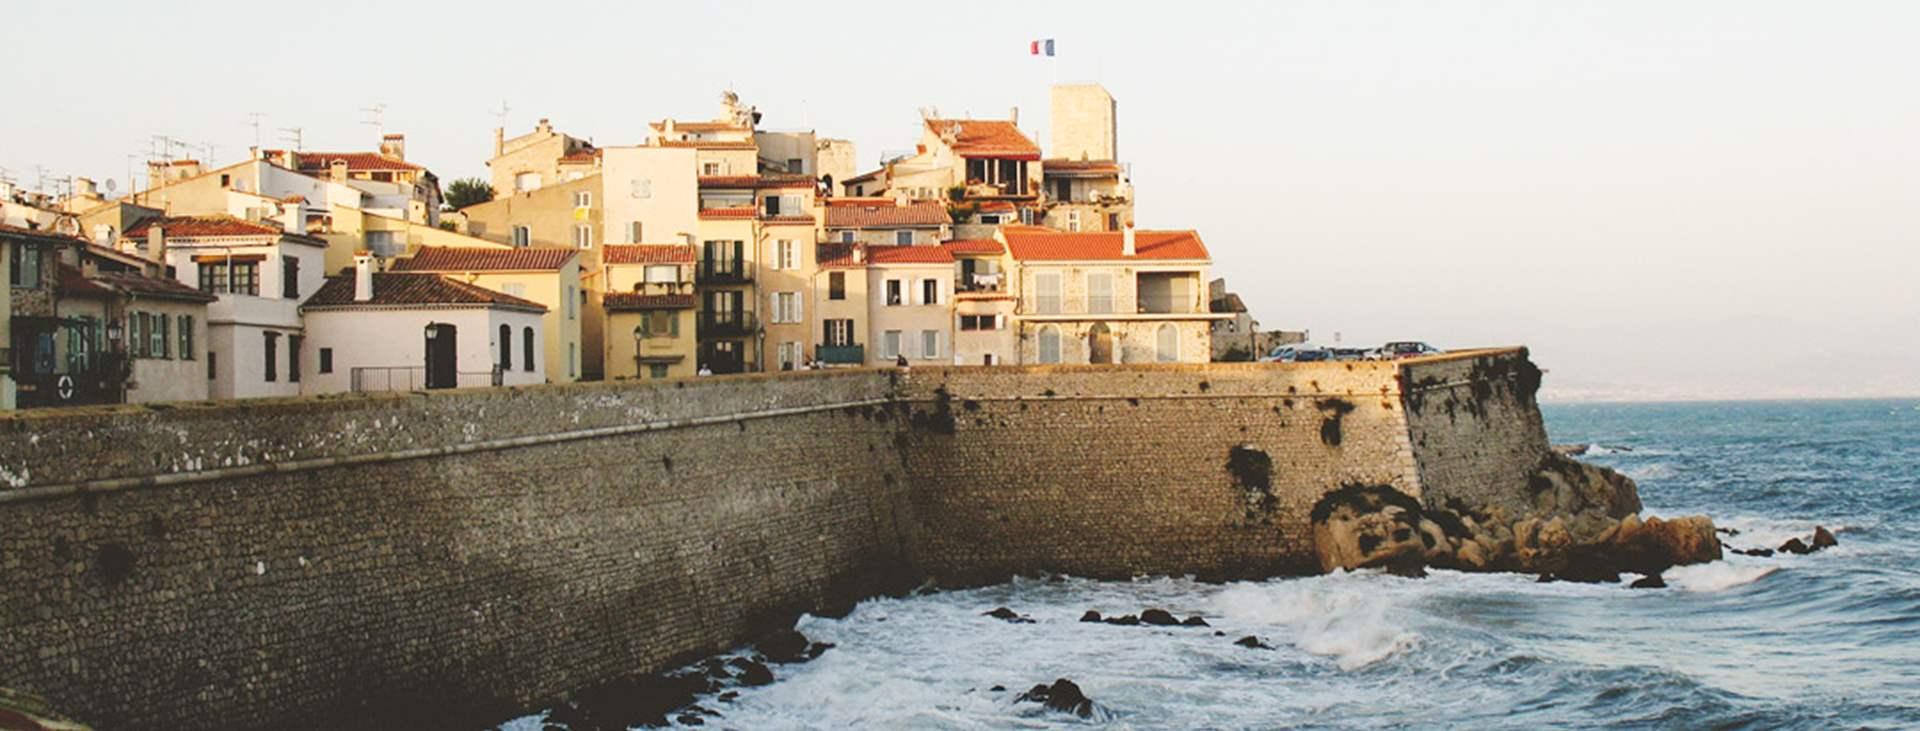 Boka en resa till Antibes/Juan Les Pins i Frankrike